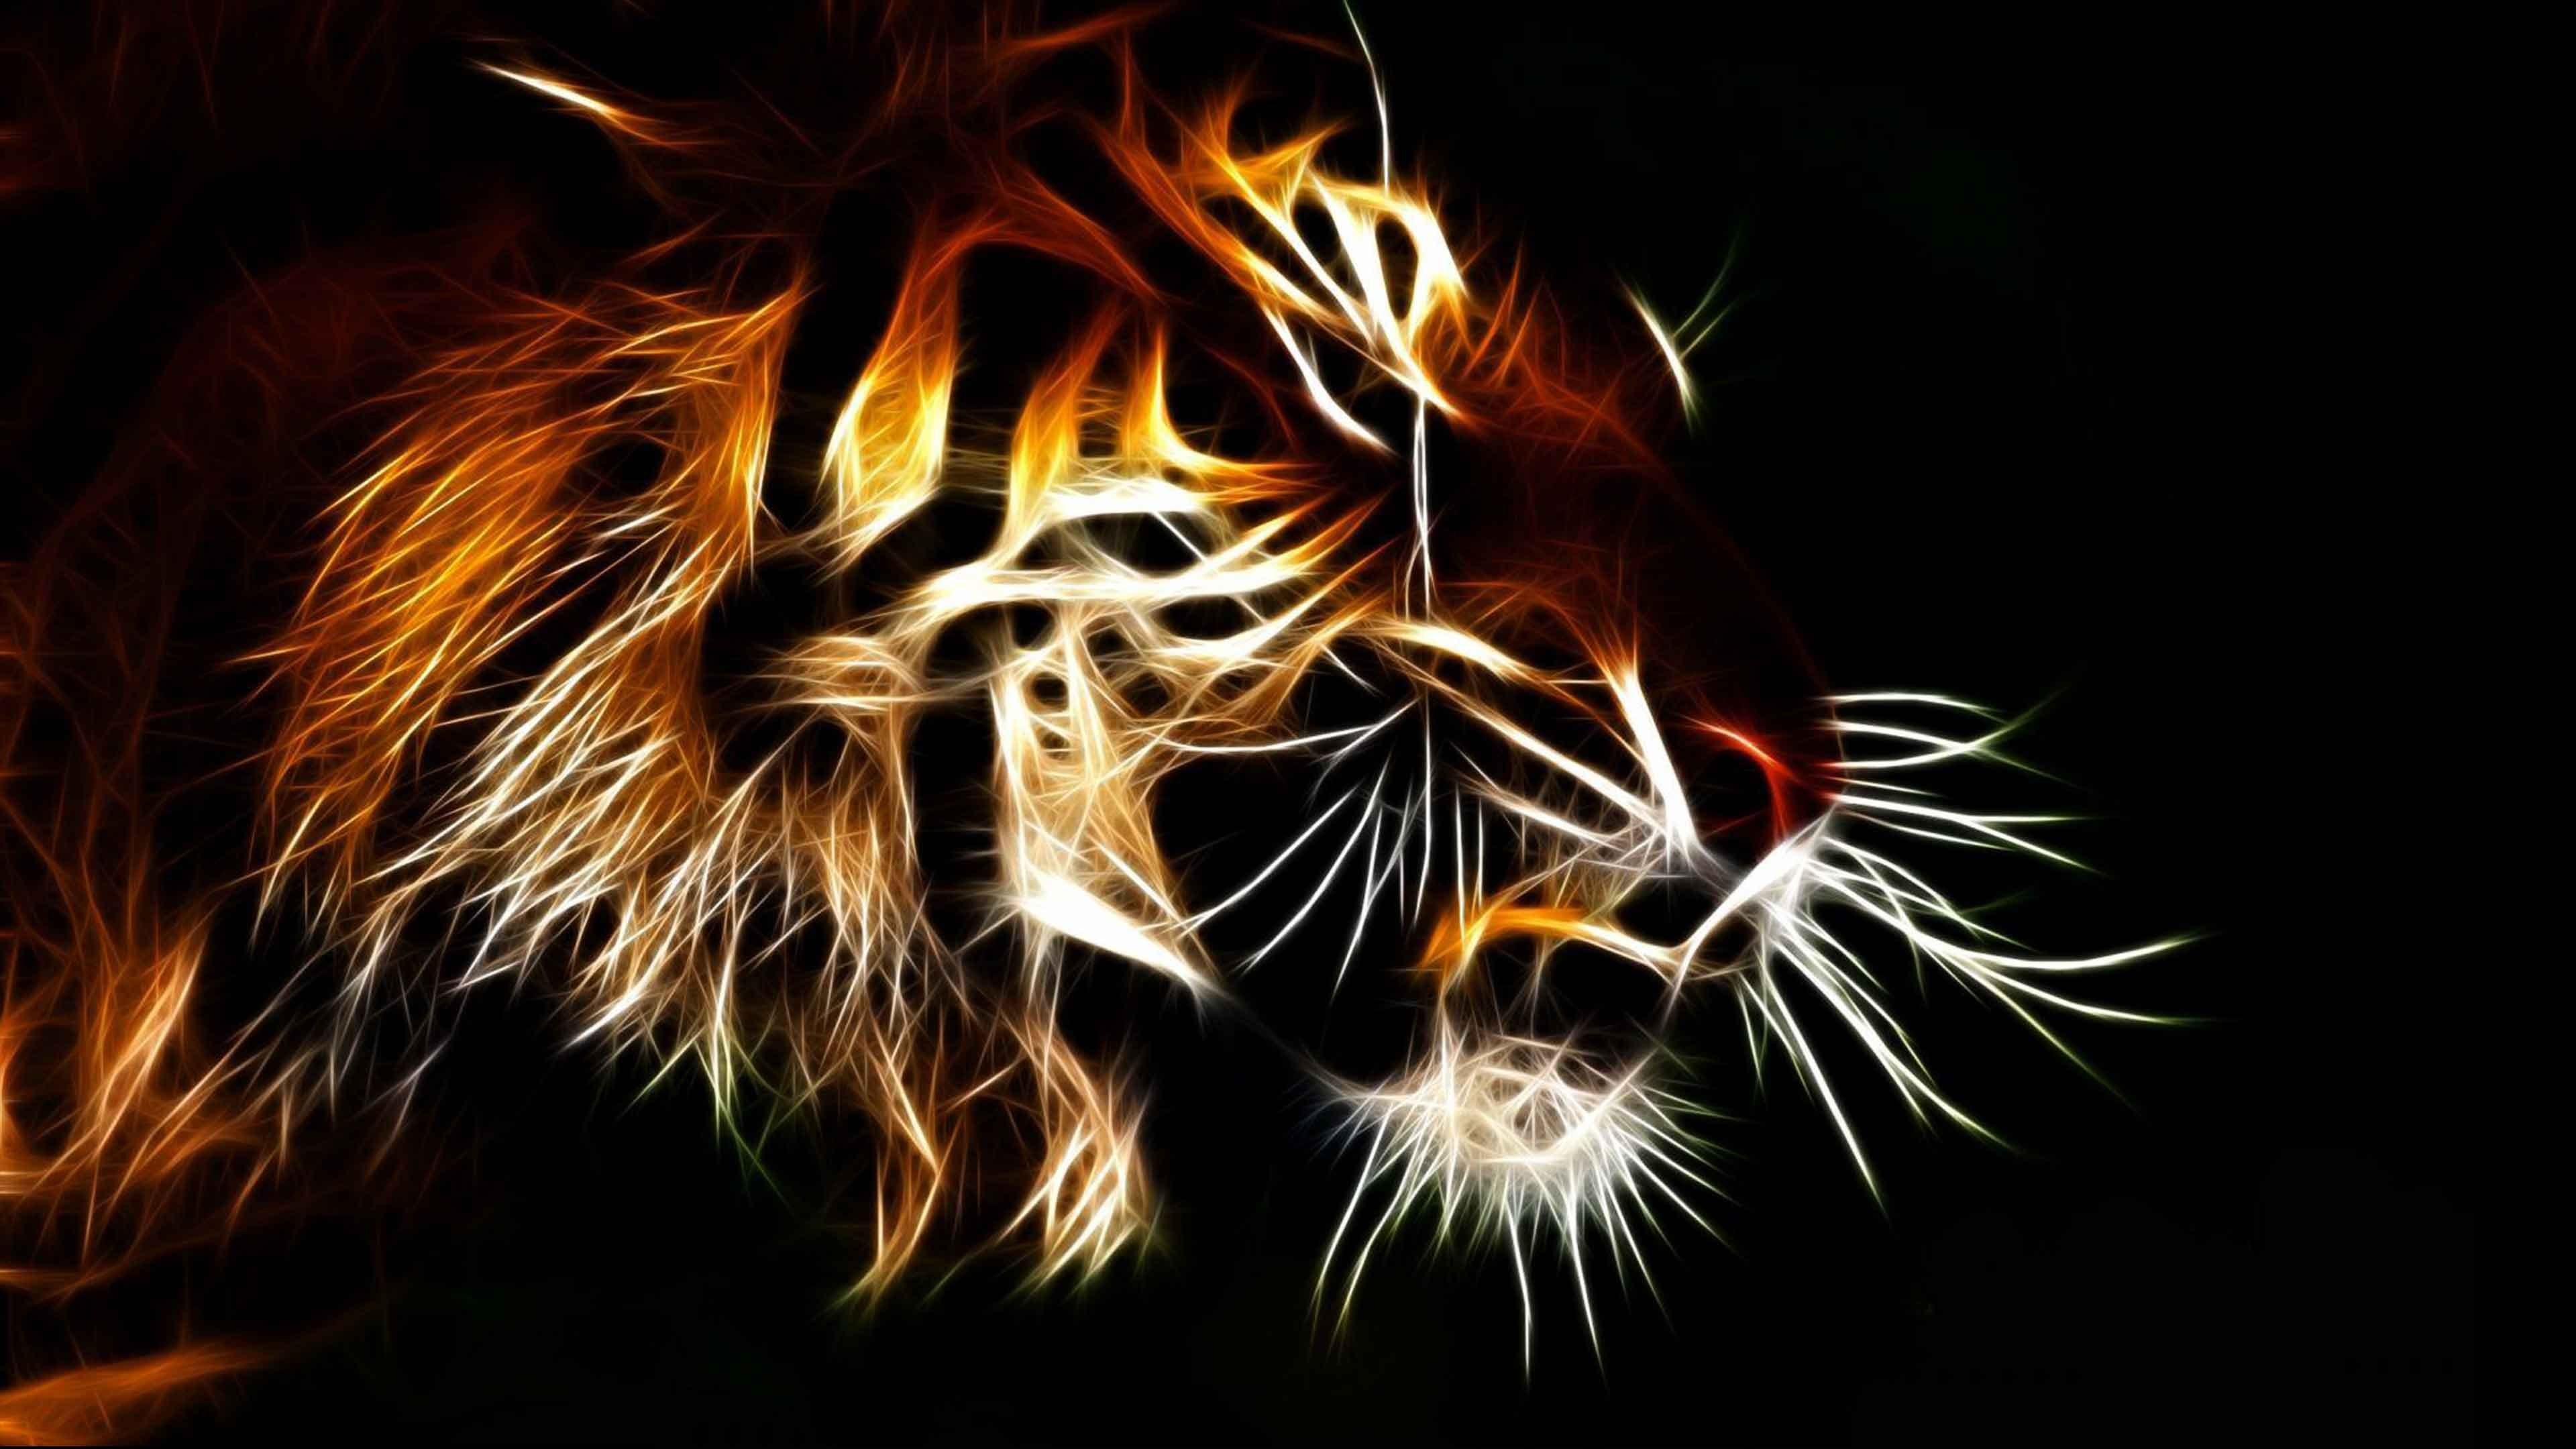 Free Tiger Desktop Wallpaper